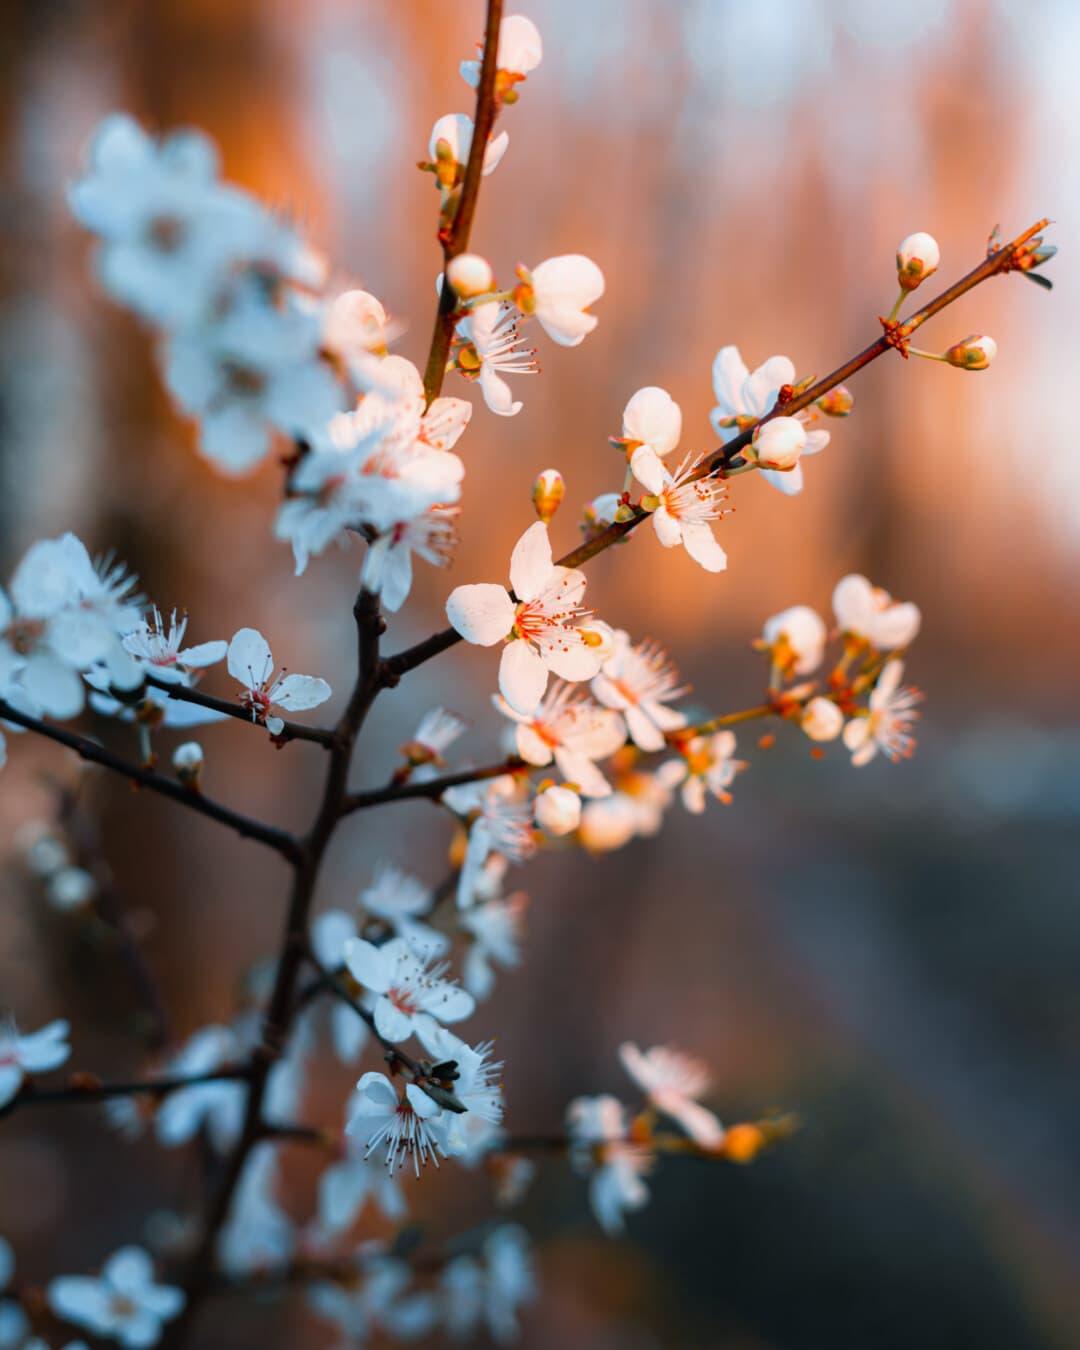 Geäst, Obstbaum, weiße Blume, Frühling, Blatt, Saison, Natur, Ast, Blüte, Struktur